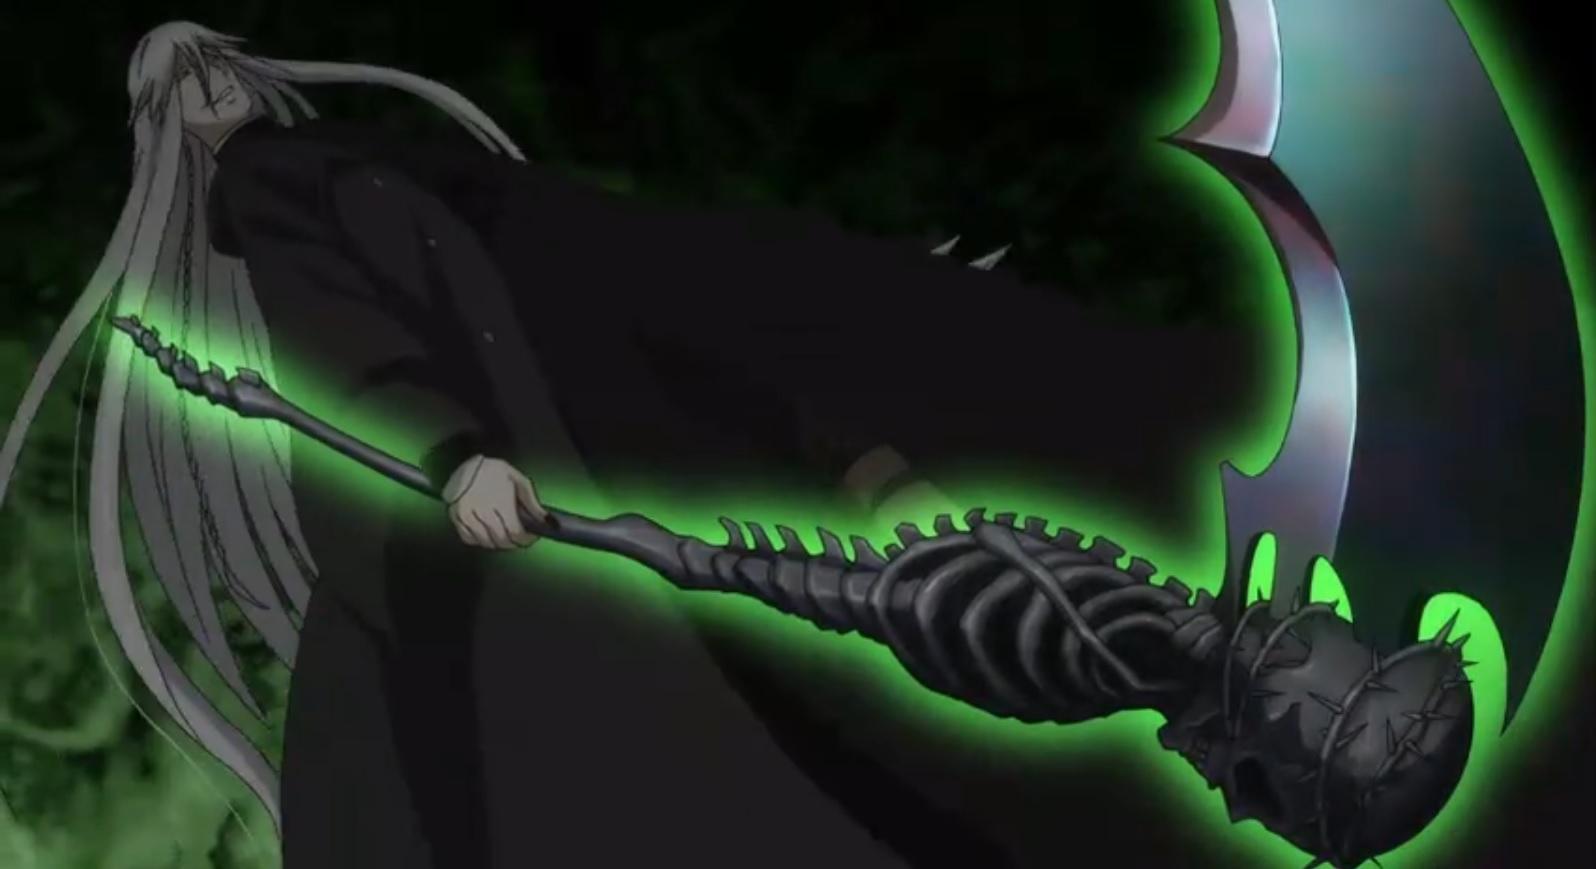 File:Undertakers death scythe by sasunaru121-d4a51v6.jpg